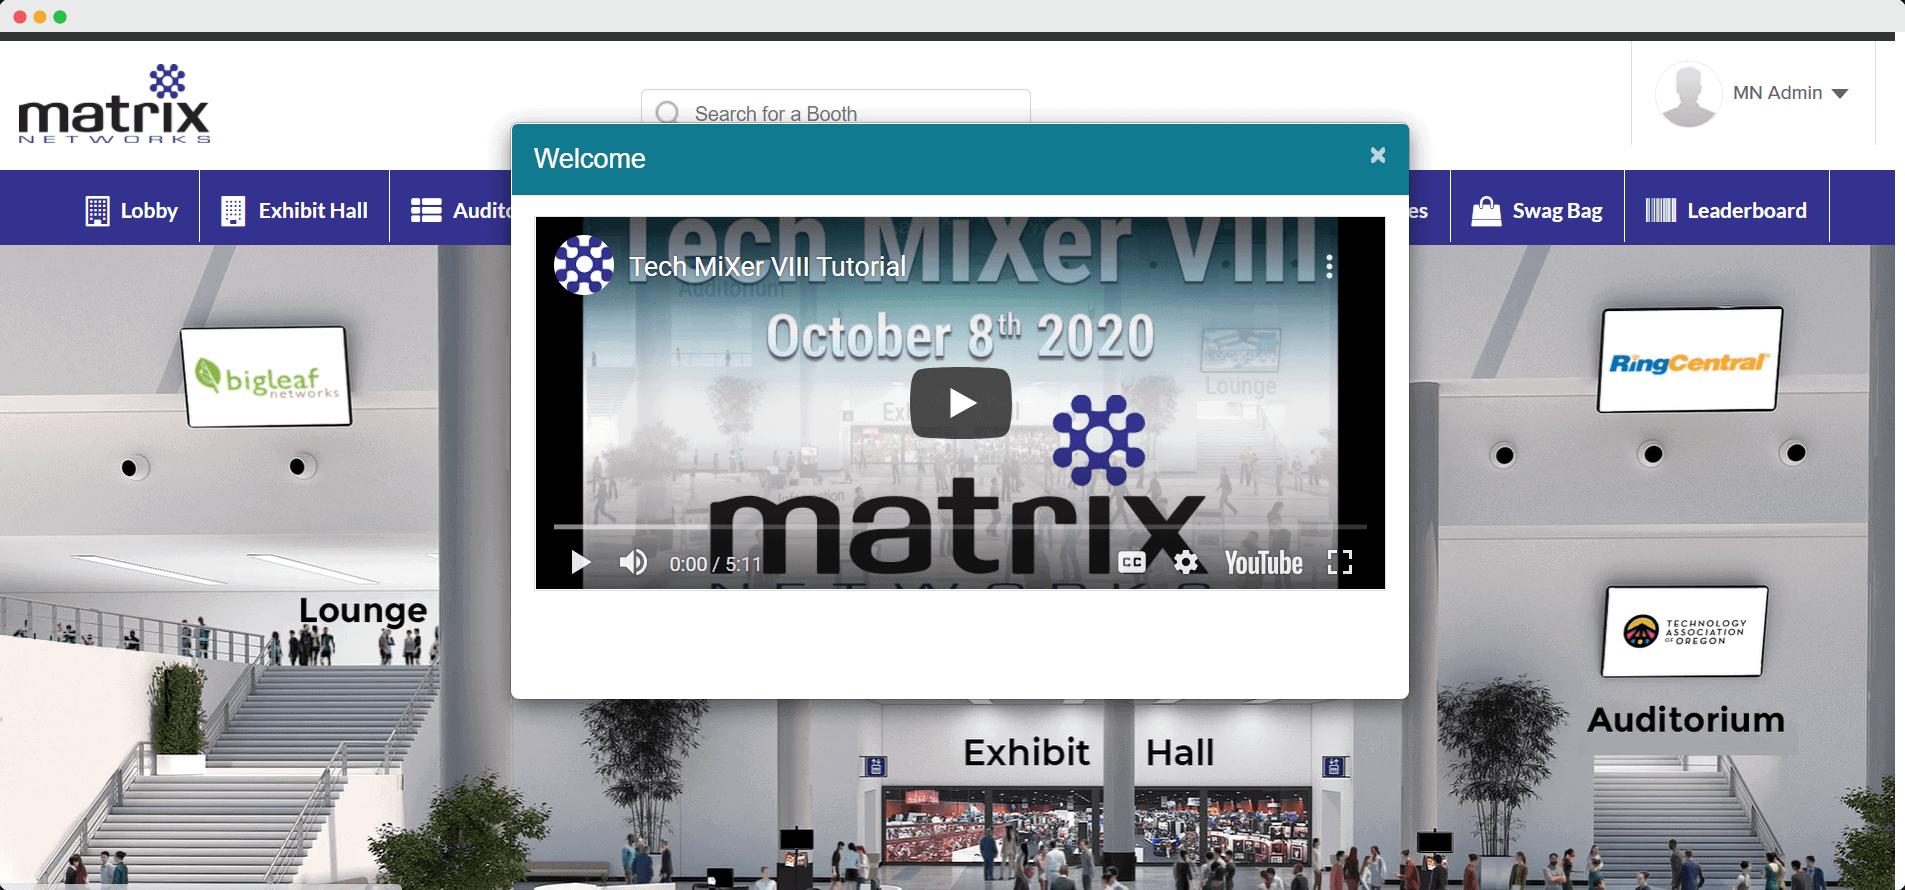 Matrix Network lobby